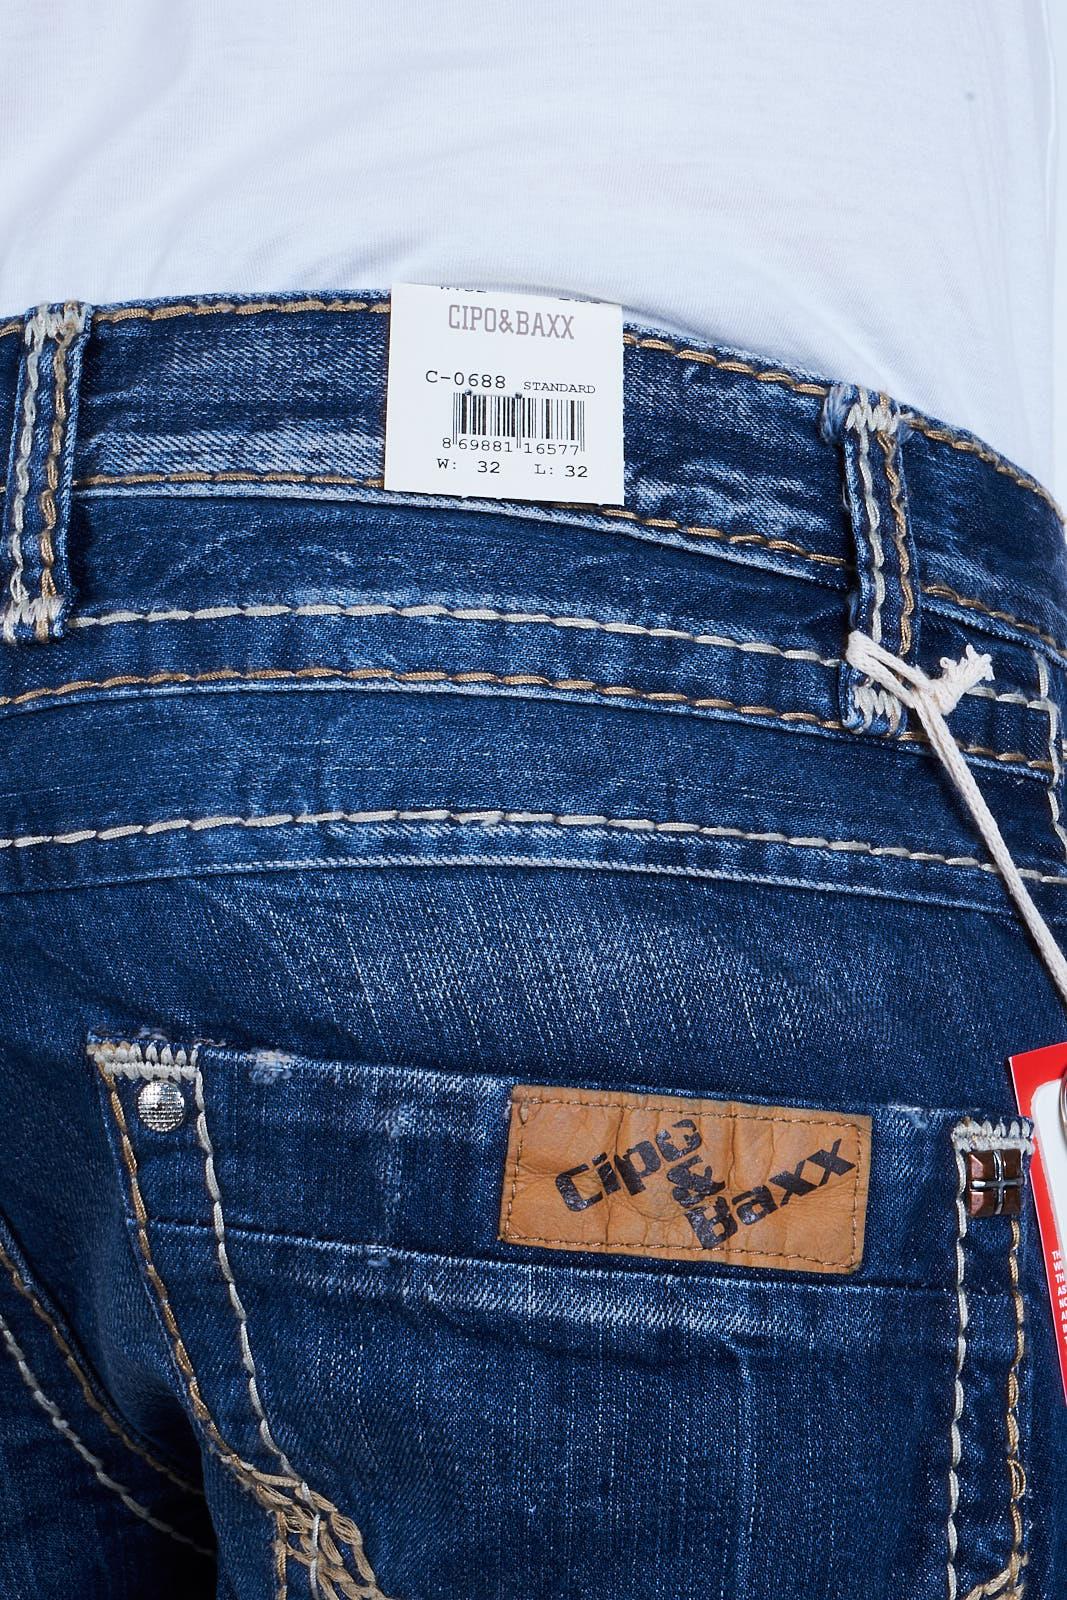 Jeans Hose Dicke Denim Straight Clubwear Designer Naht C Baxx 0688 Cipo amp; Herren qwx4tYF